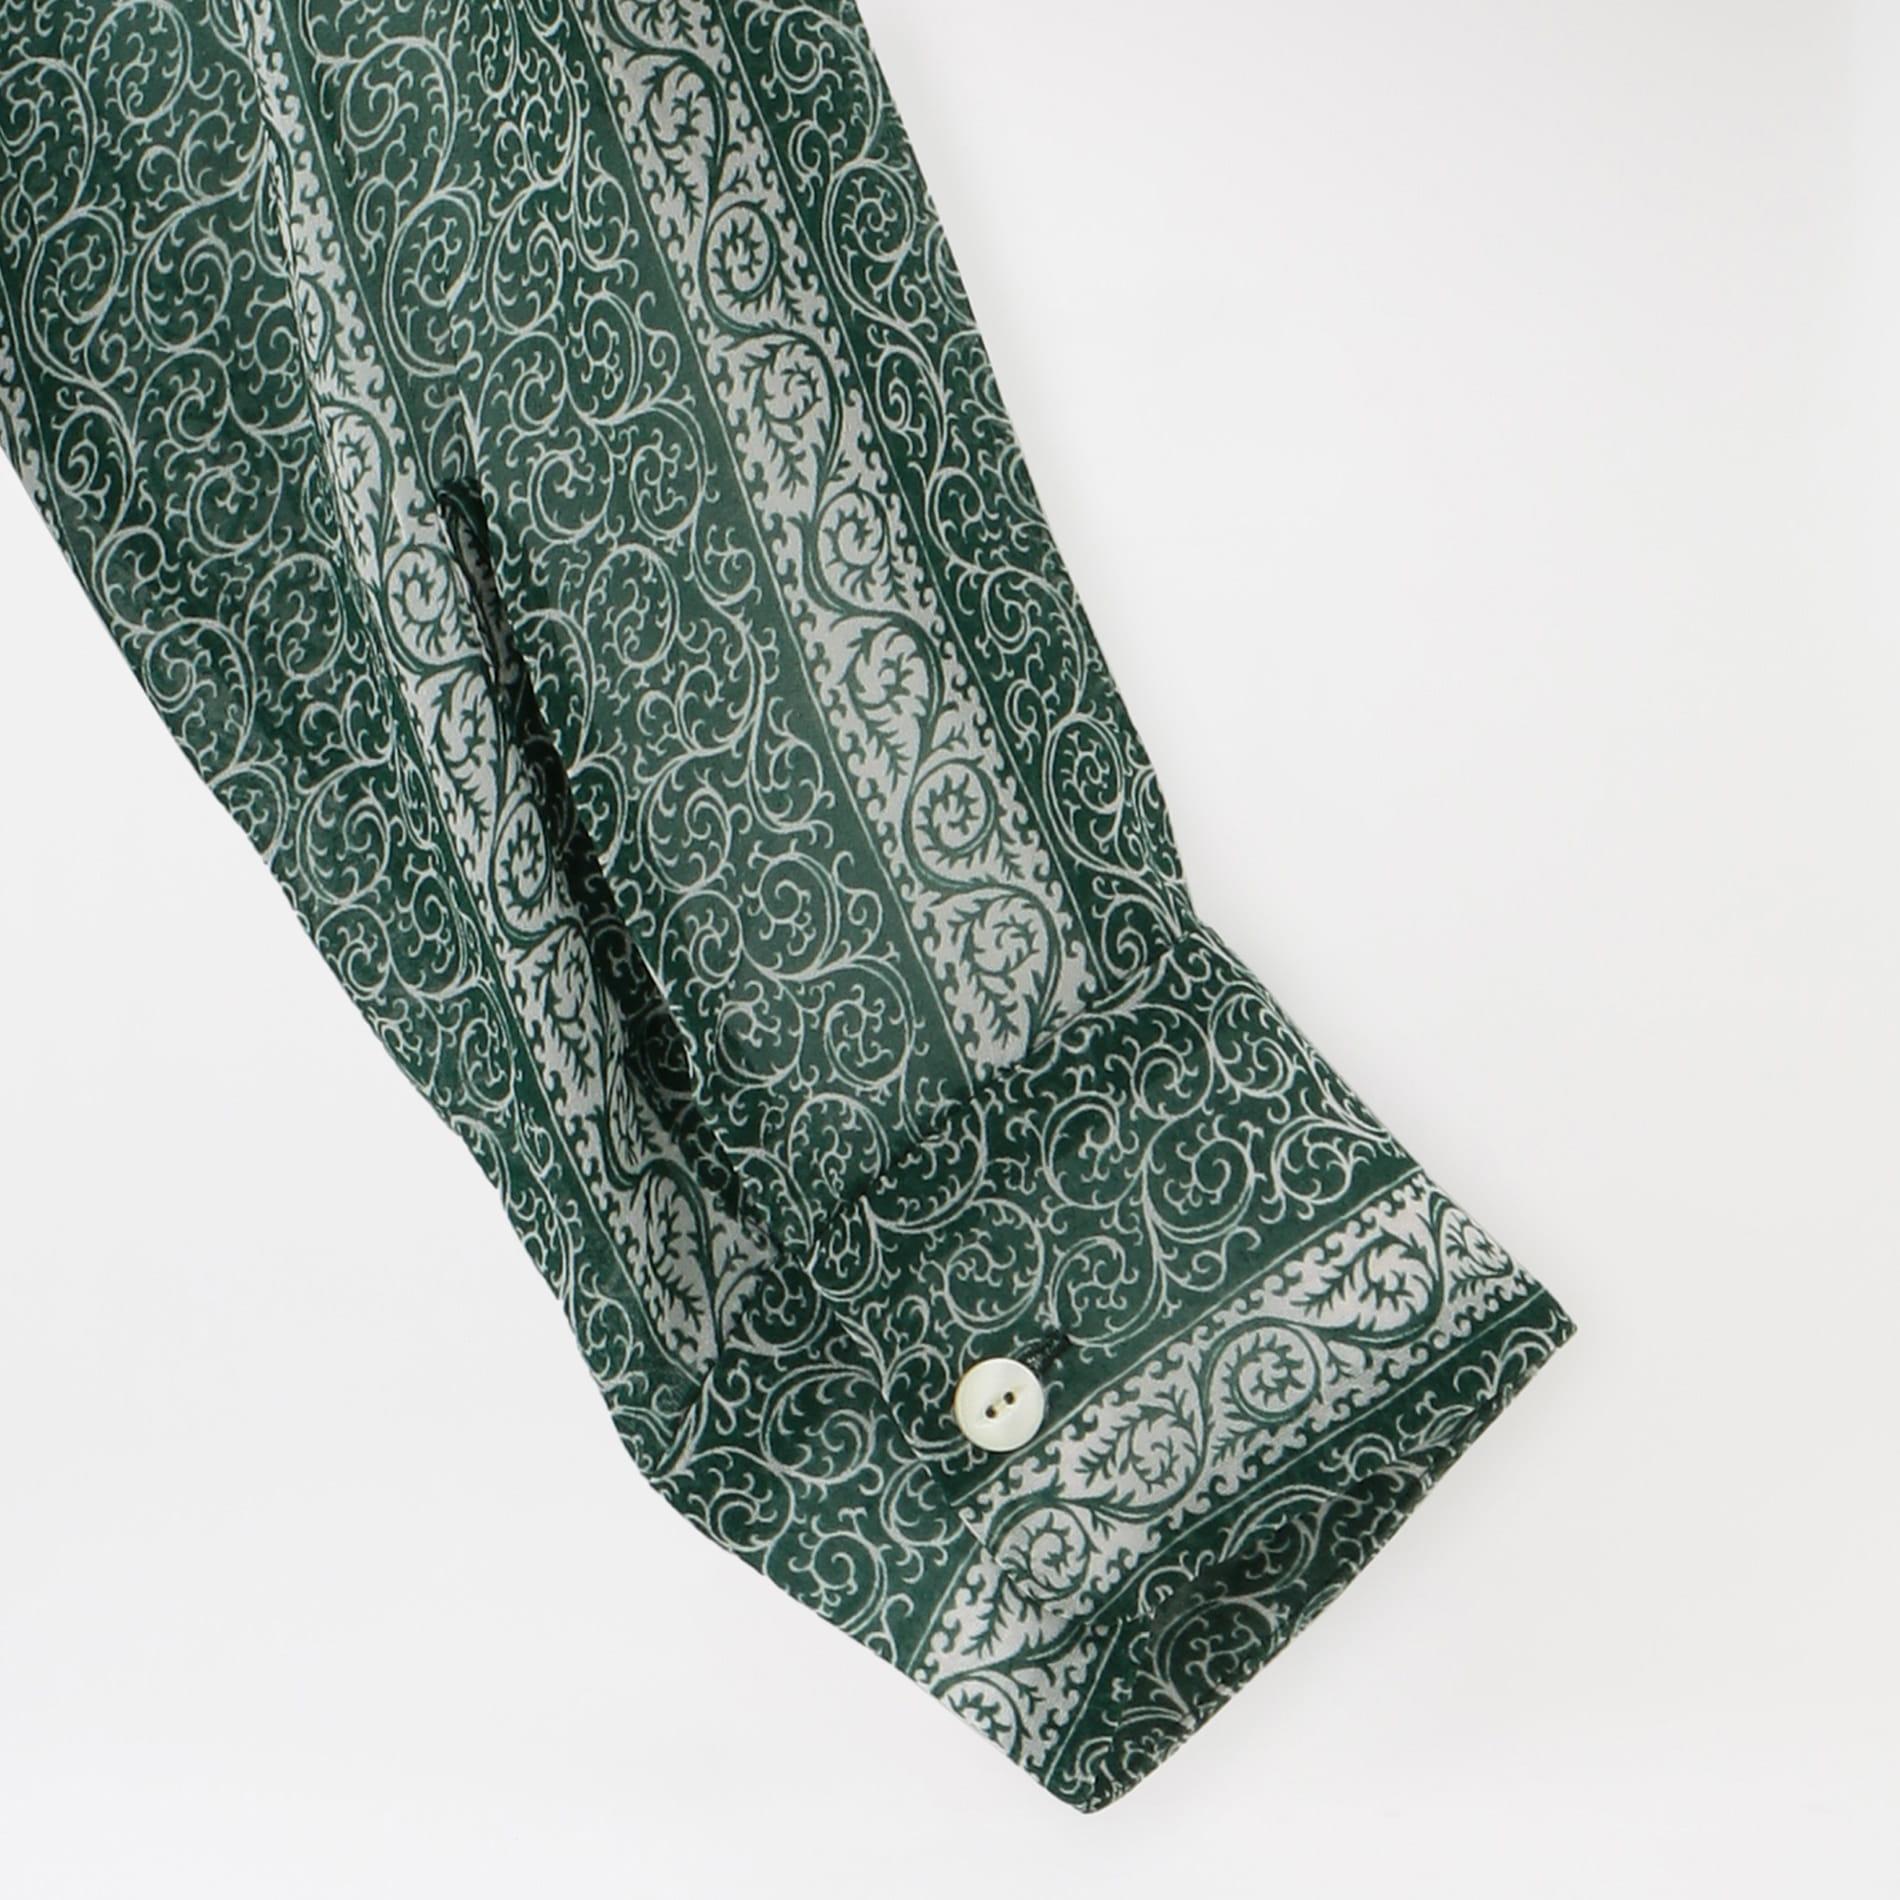 【Needles】WOMEN シャツ C.O.B. Classic Shirt - Cupra Chiffon / Pt. IN076